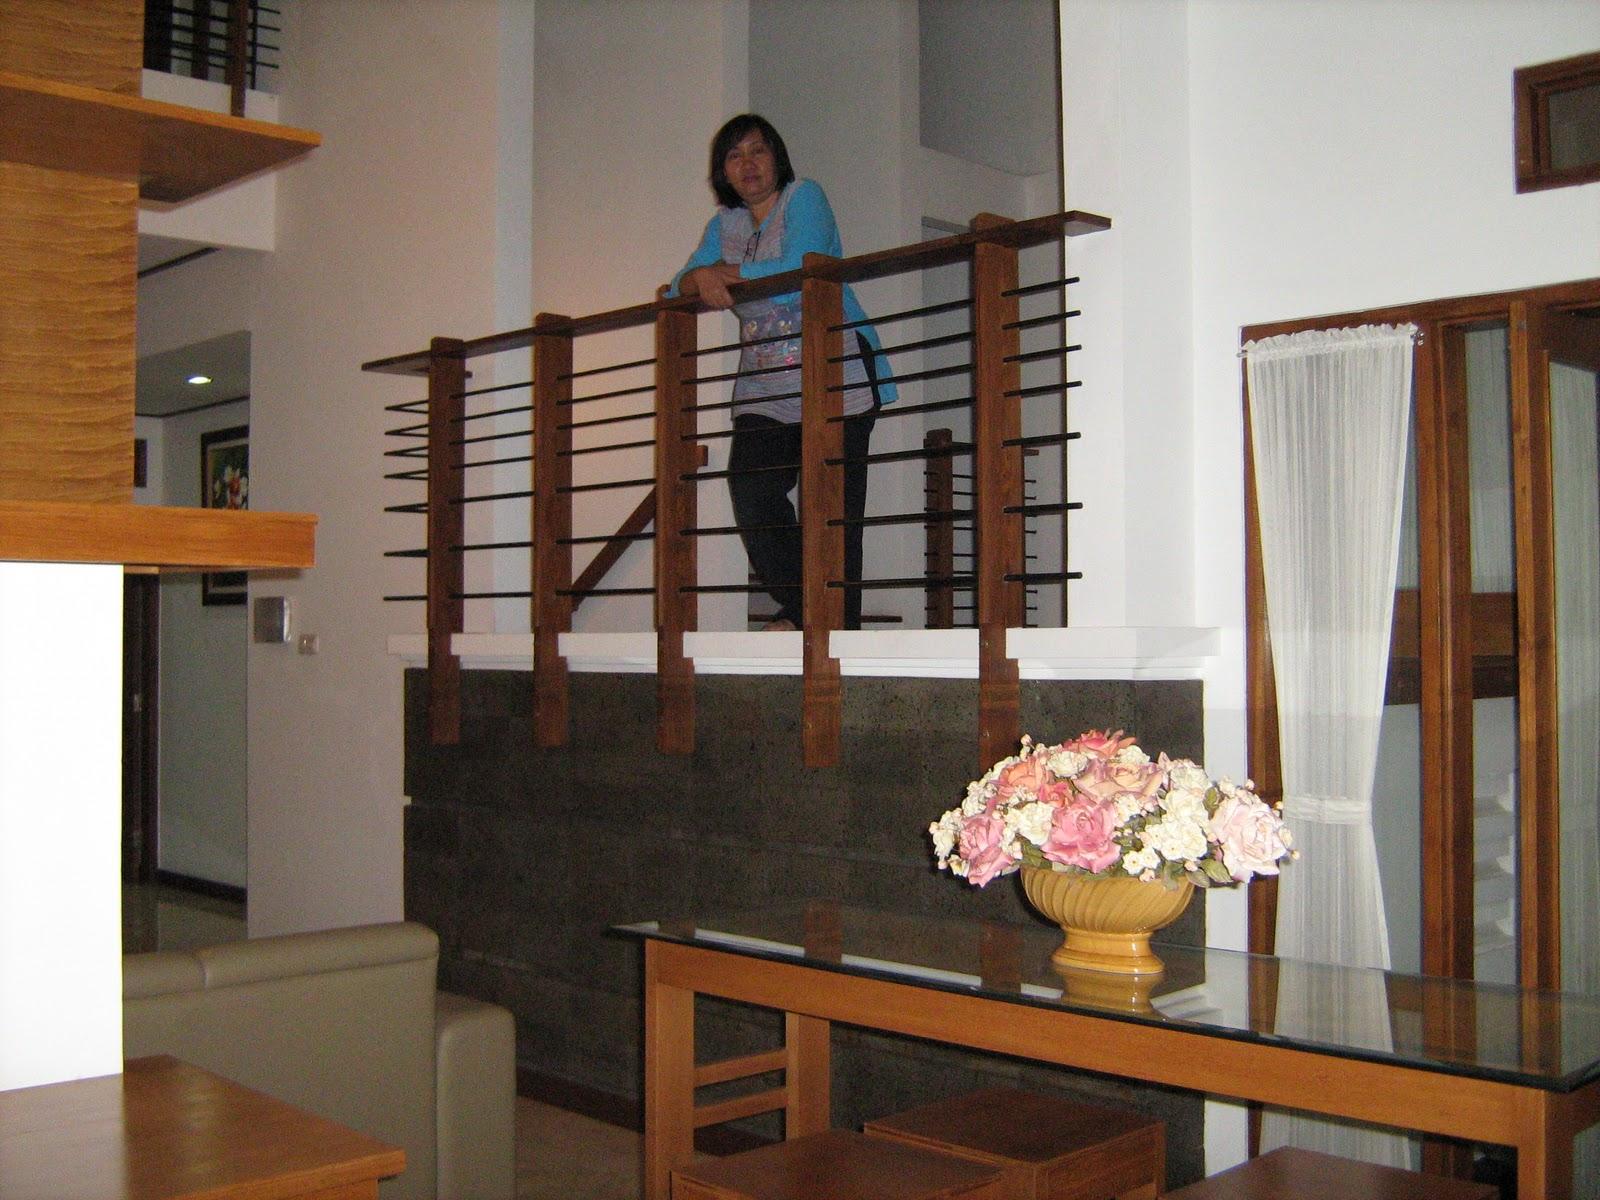 Rumah Impresi Visual Half Landing Kampong Style In Town